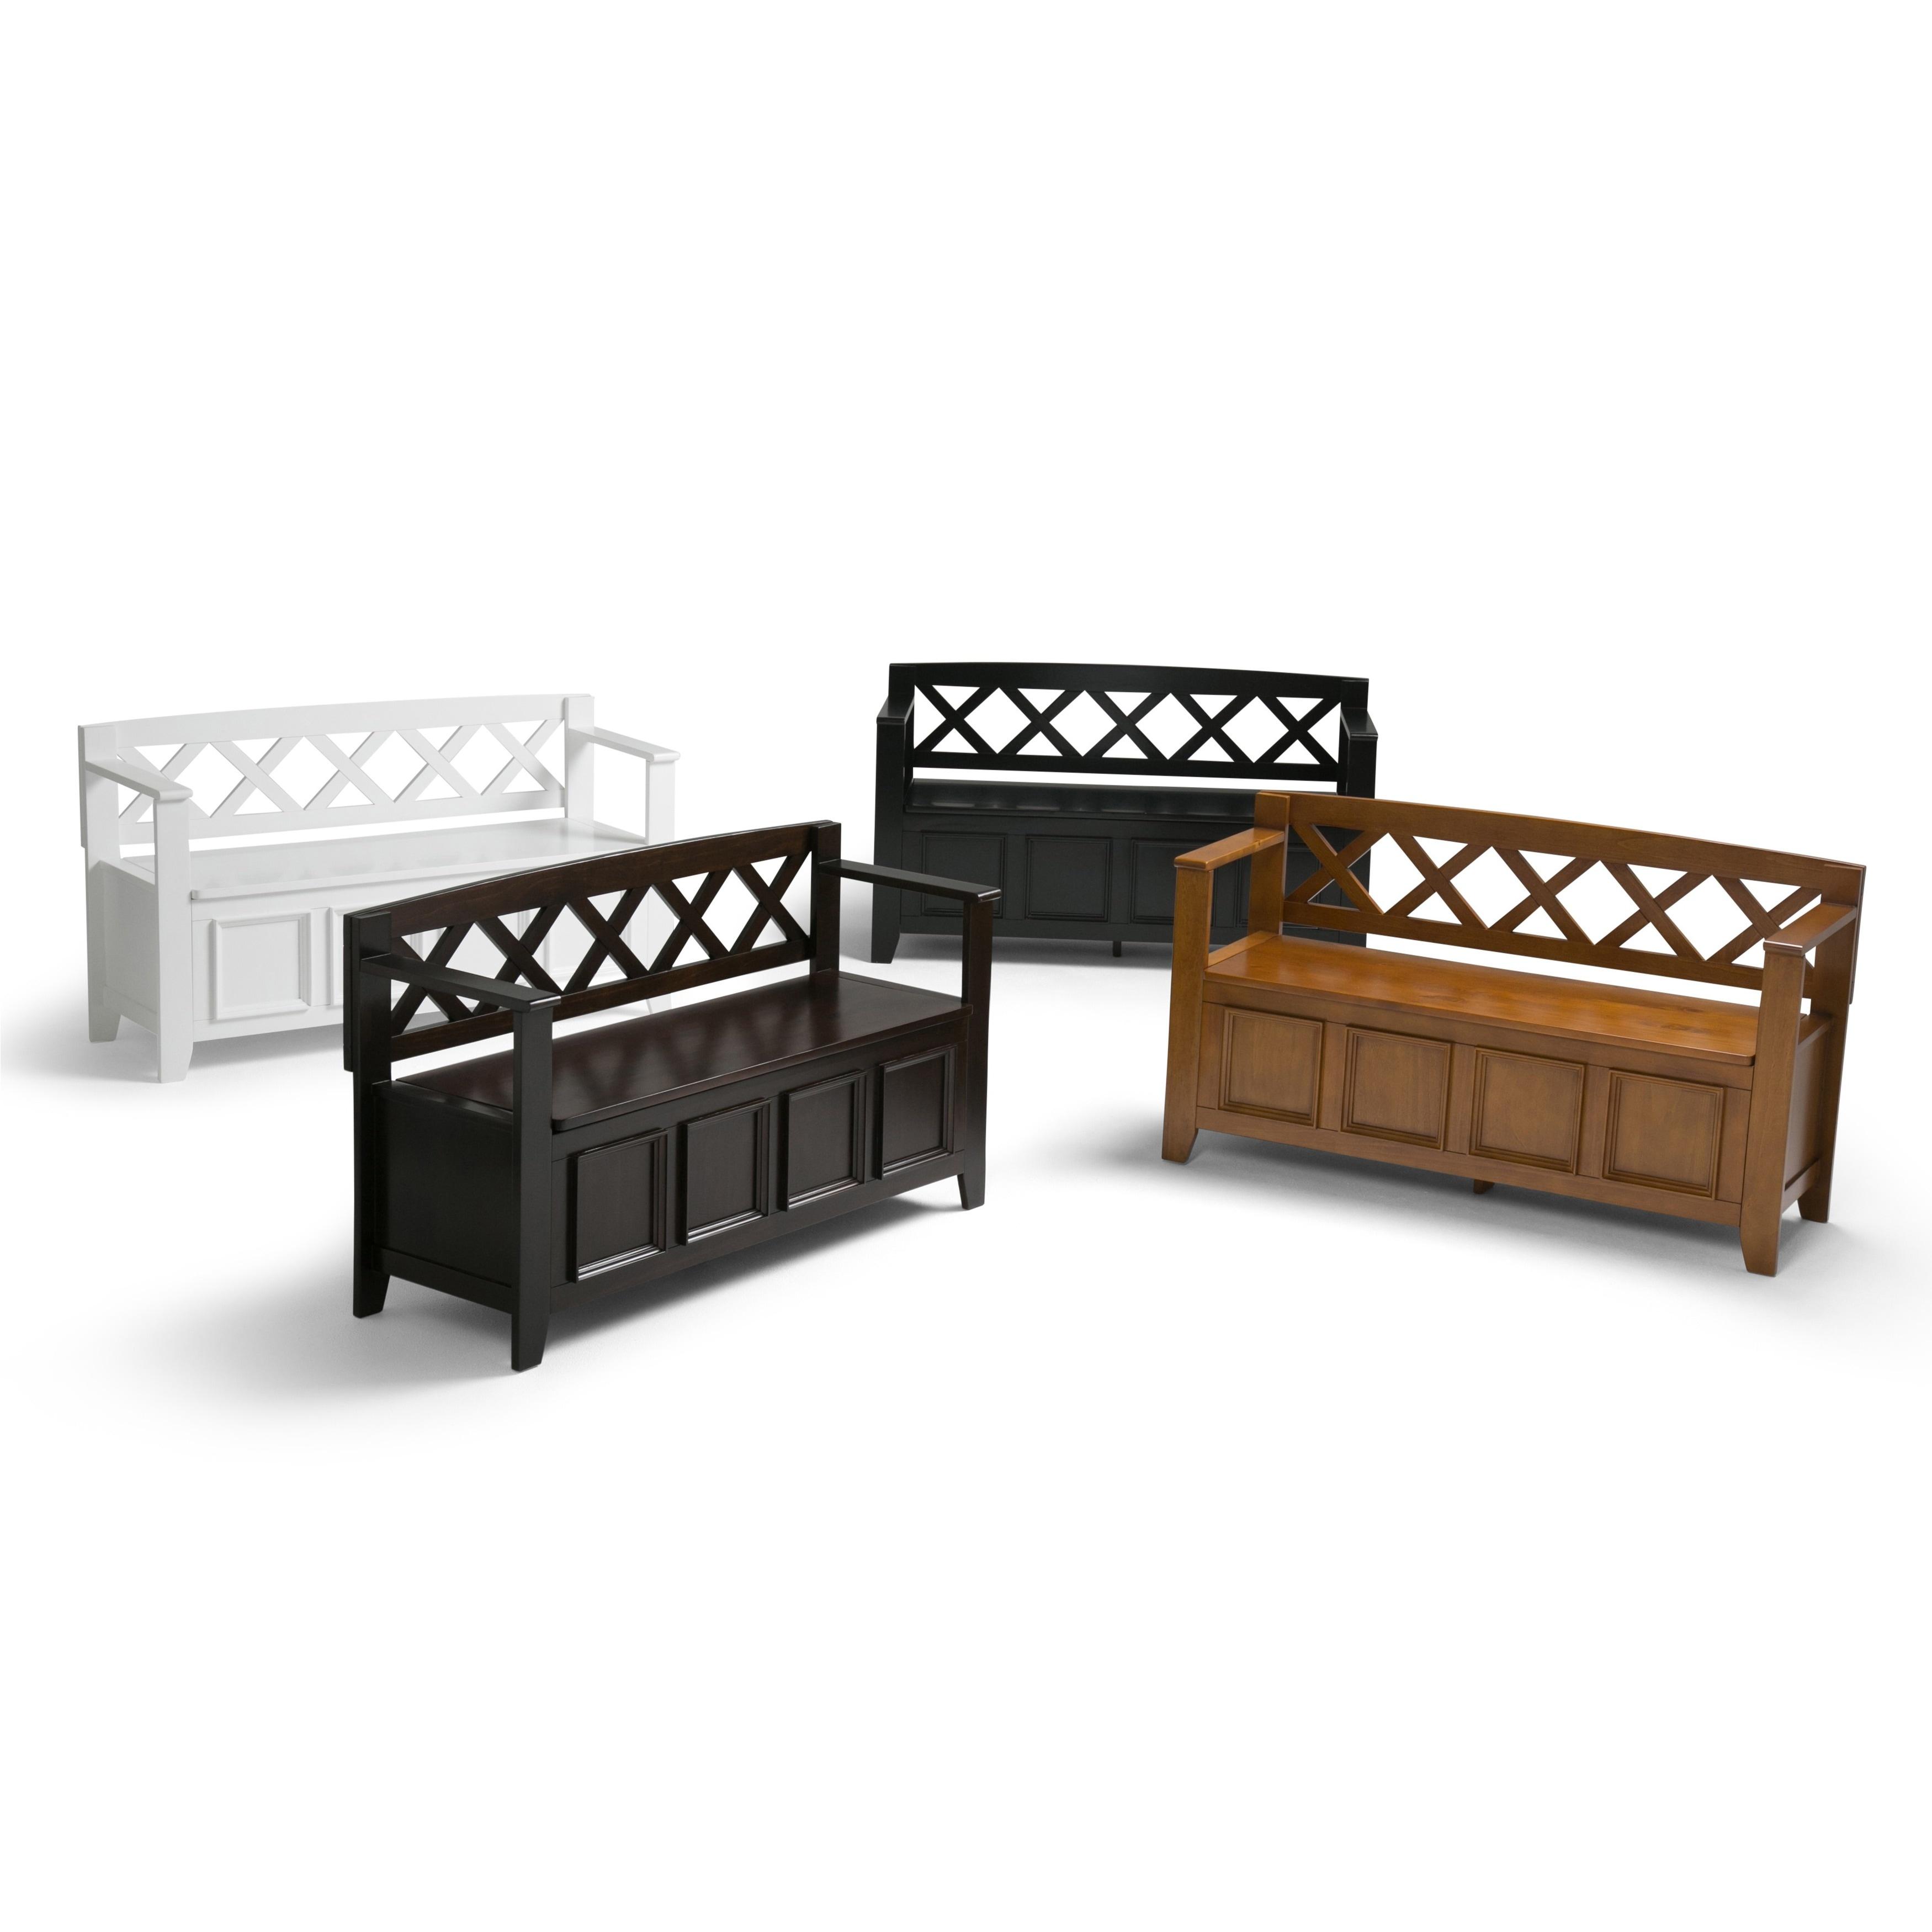 WYNDENHALL Halifax Entryway Storage Bench - Free Shipping Today ...